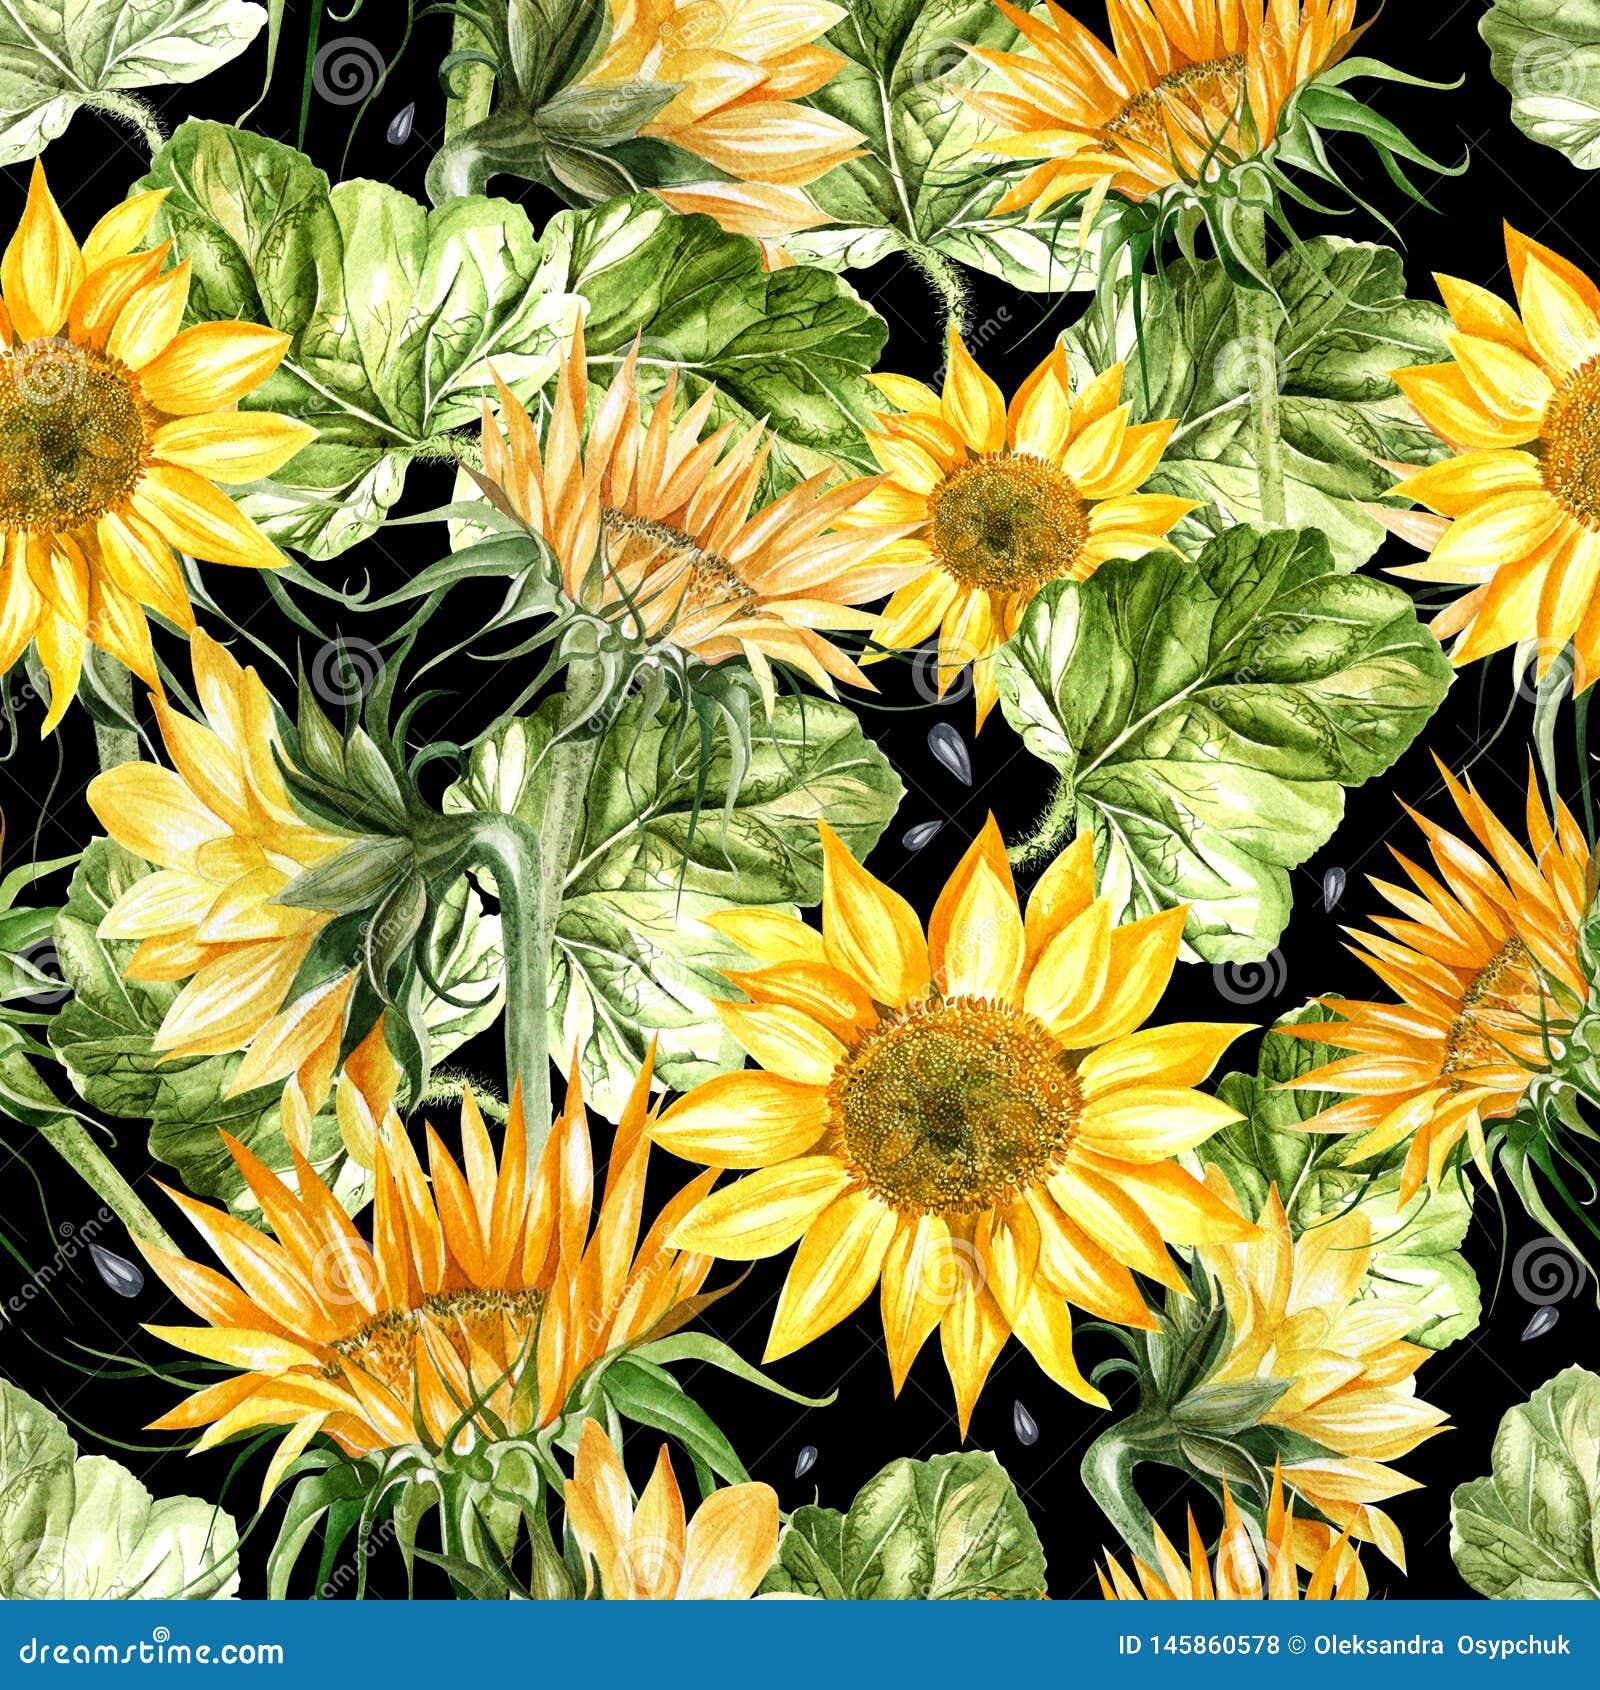 Mooi waterverf naadloos patroon met zonnebloem en bladeren